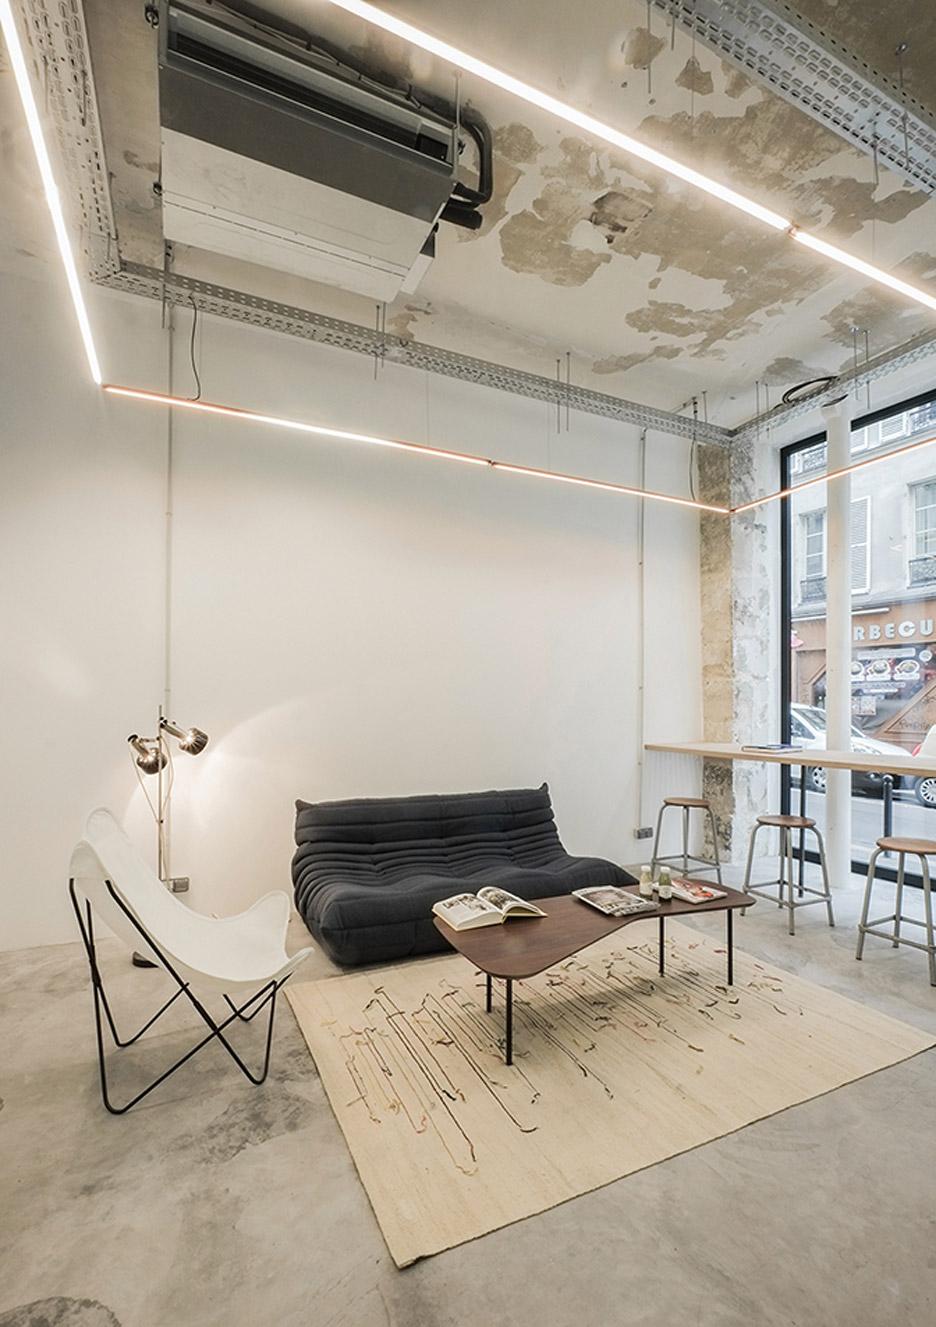 Architecture-paris-sport-club-design-studia-interiors-osnovadesign-osnova-poltava-07